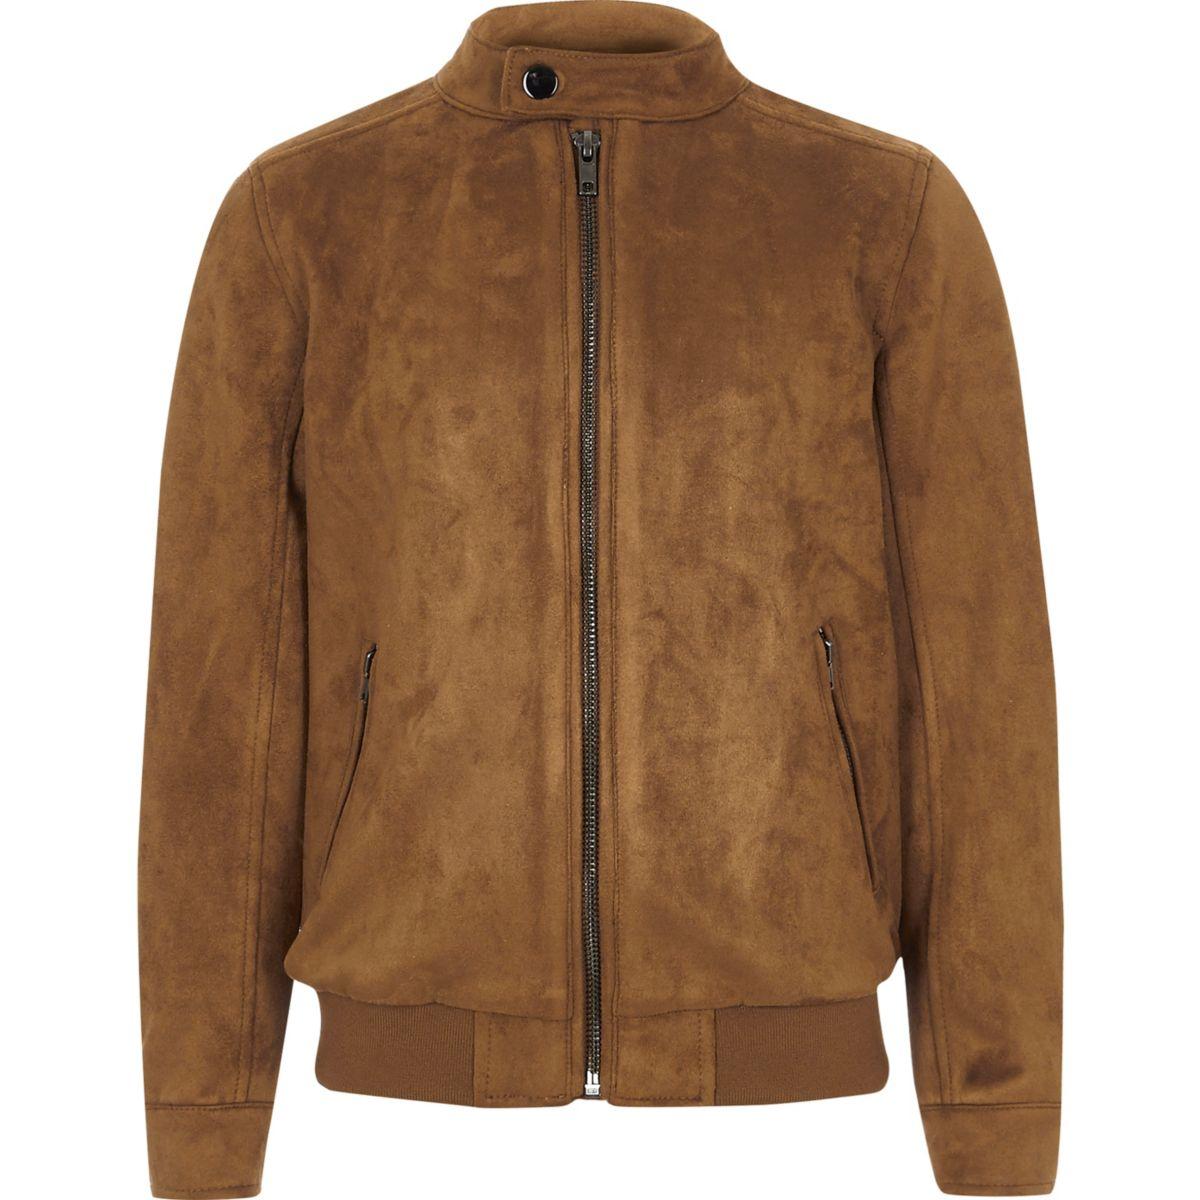 Boys tan faux suede racer jacket